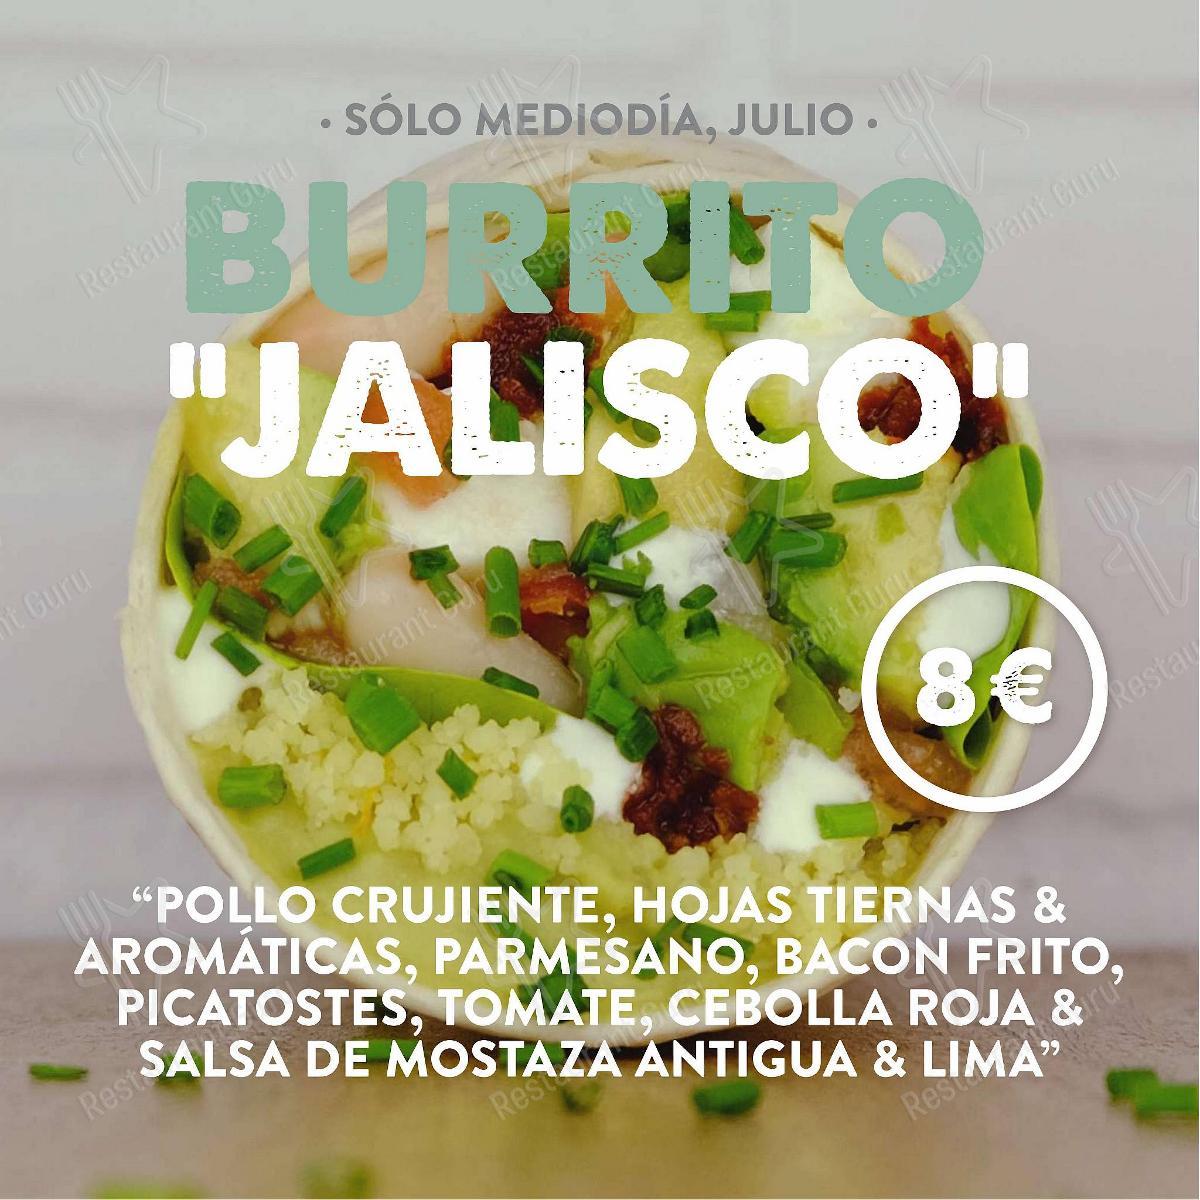 Hamburguesería Jalos menu - dishes and beverages